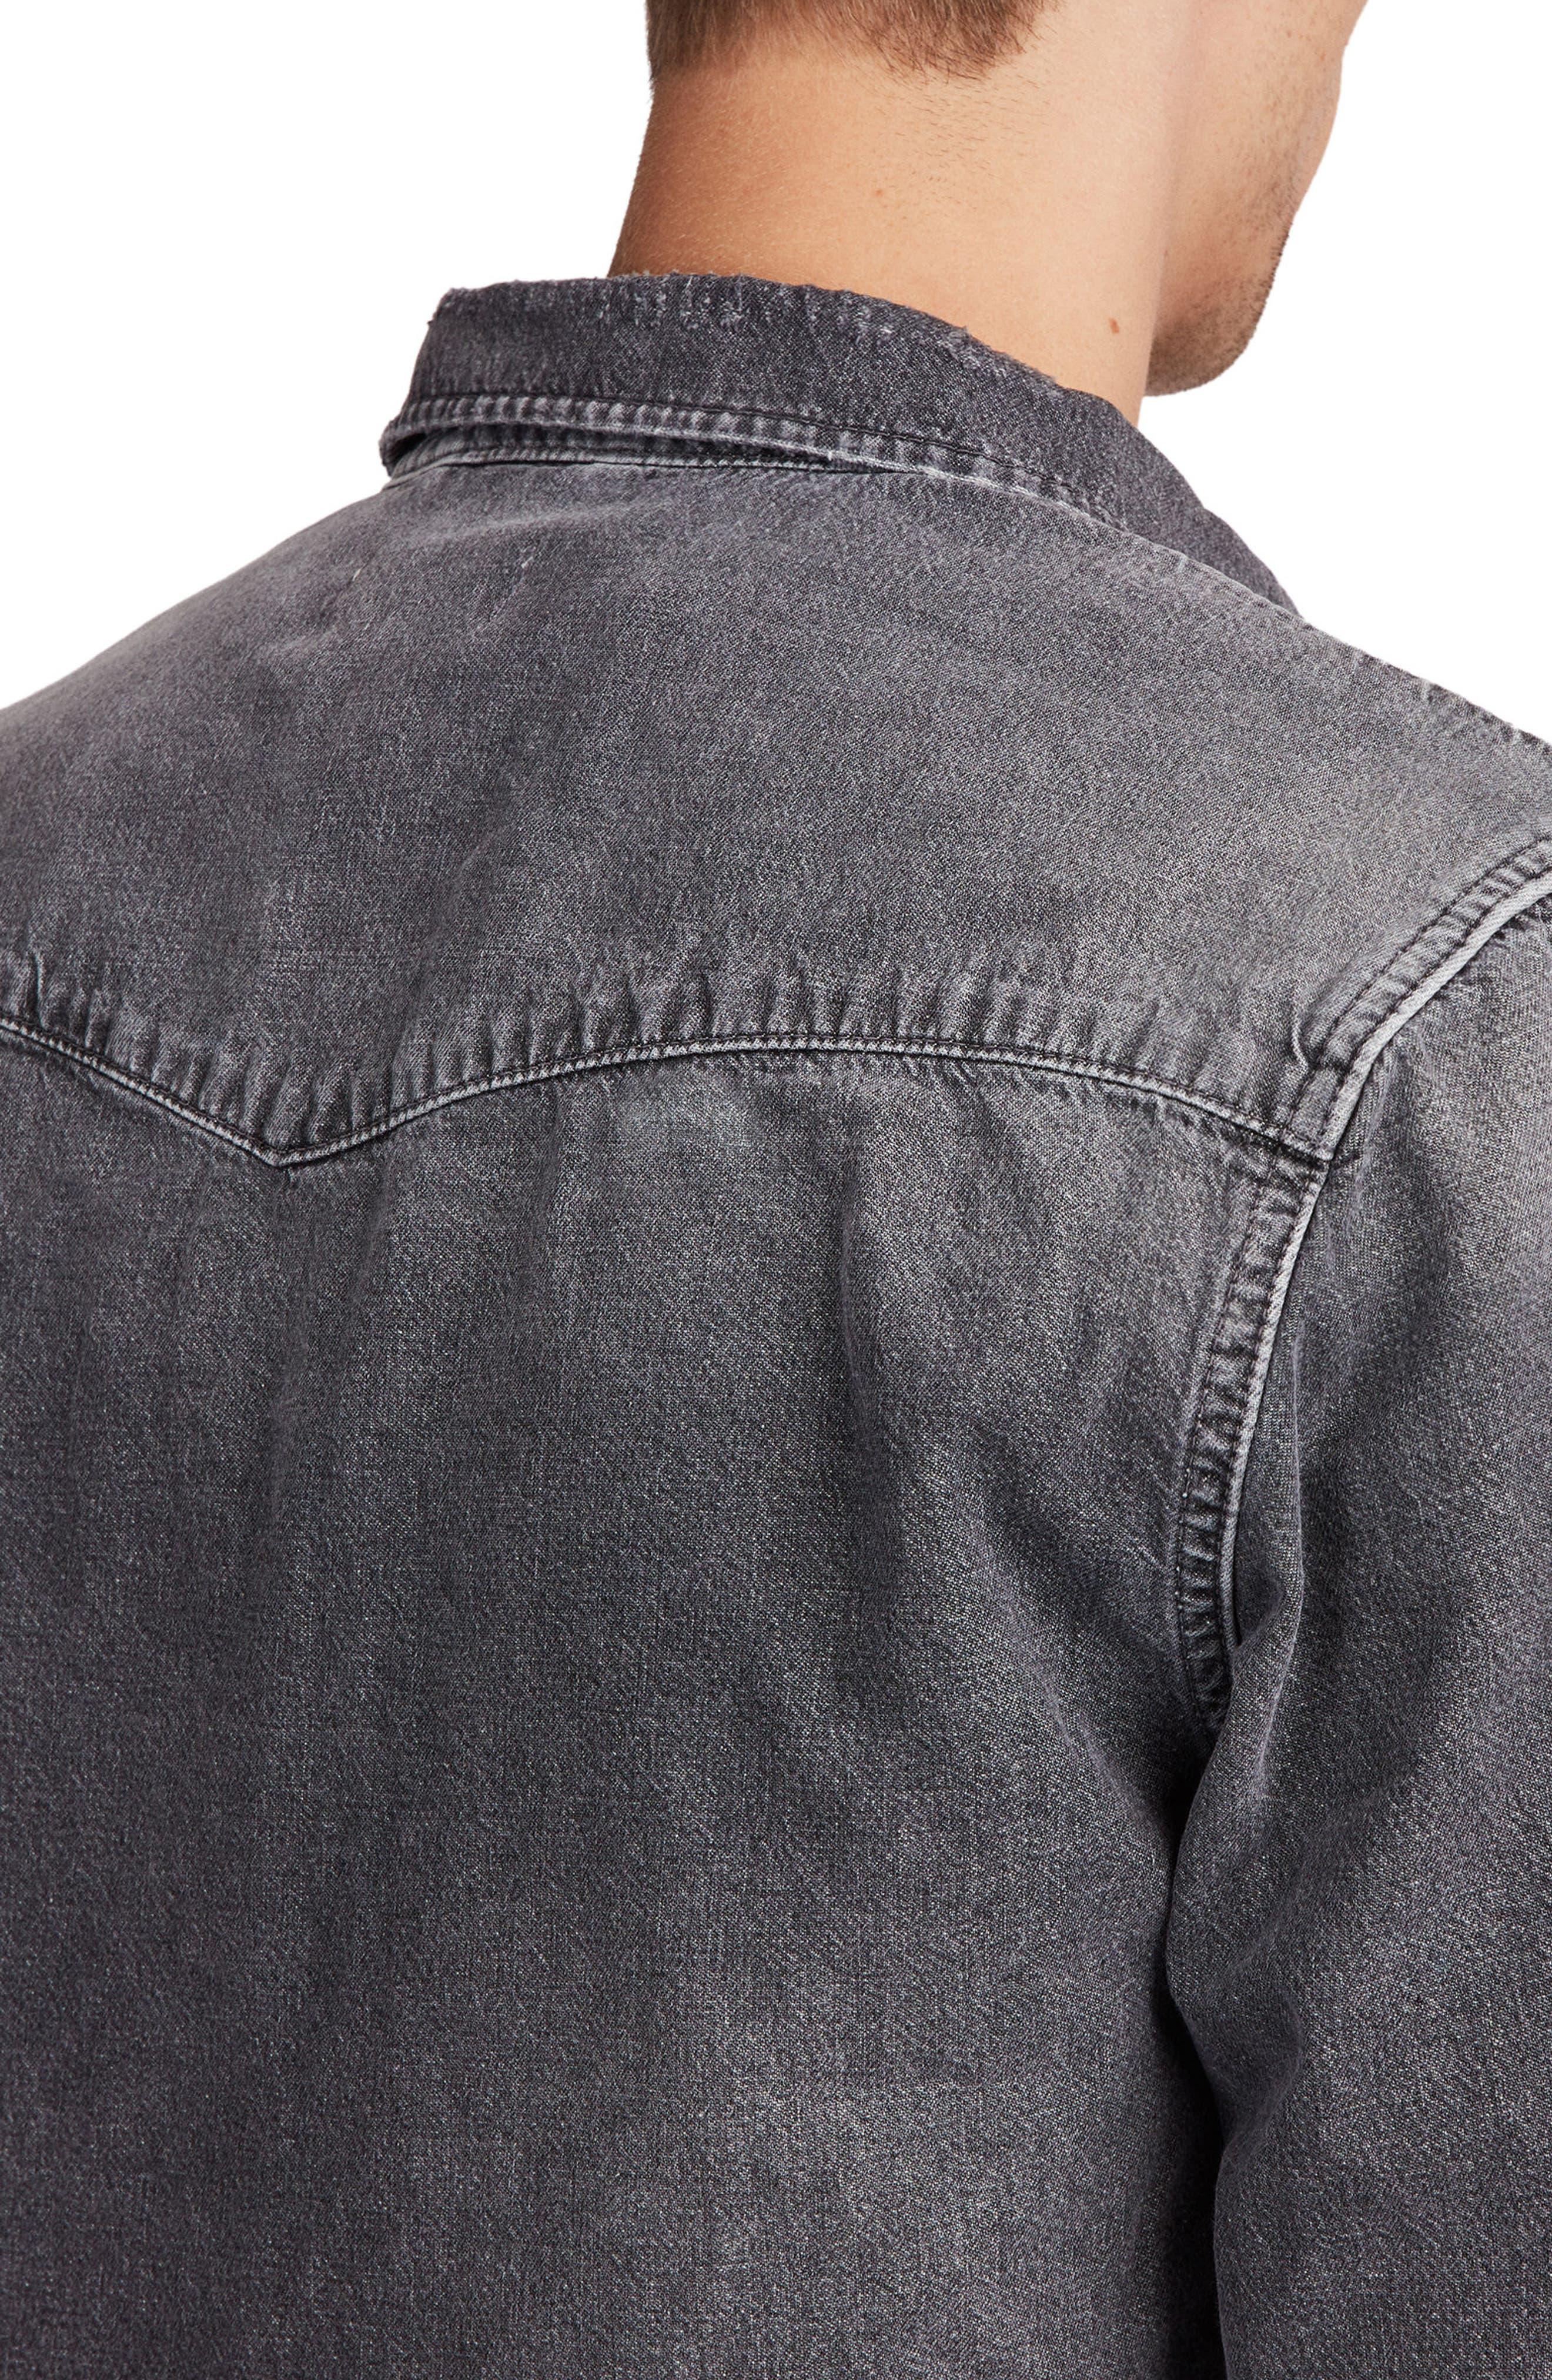 Beegan Distressed Denim Shirt Jacket,                             Alternate thumbnail 2, color,                             001